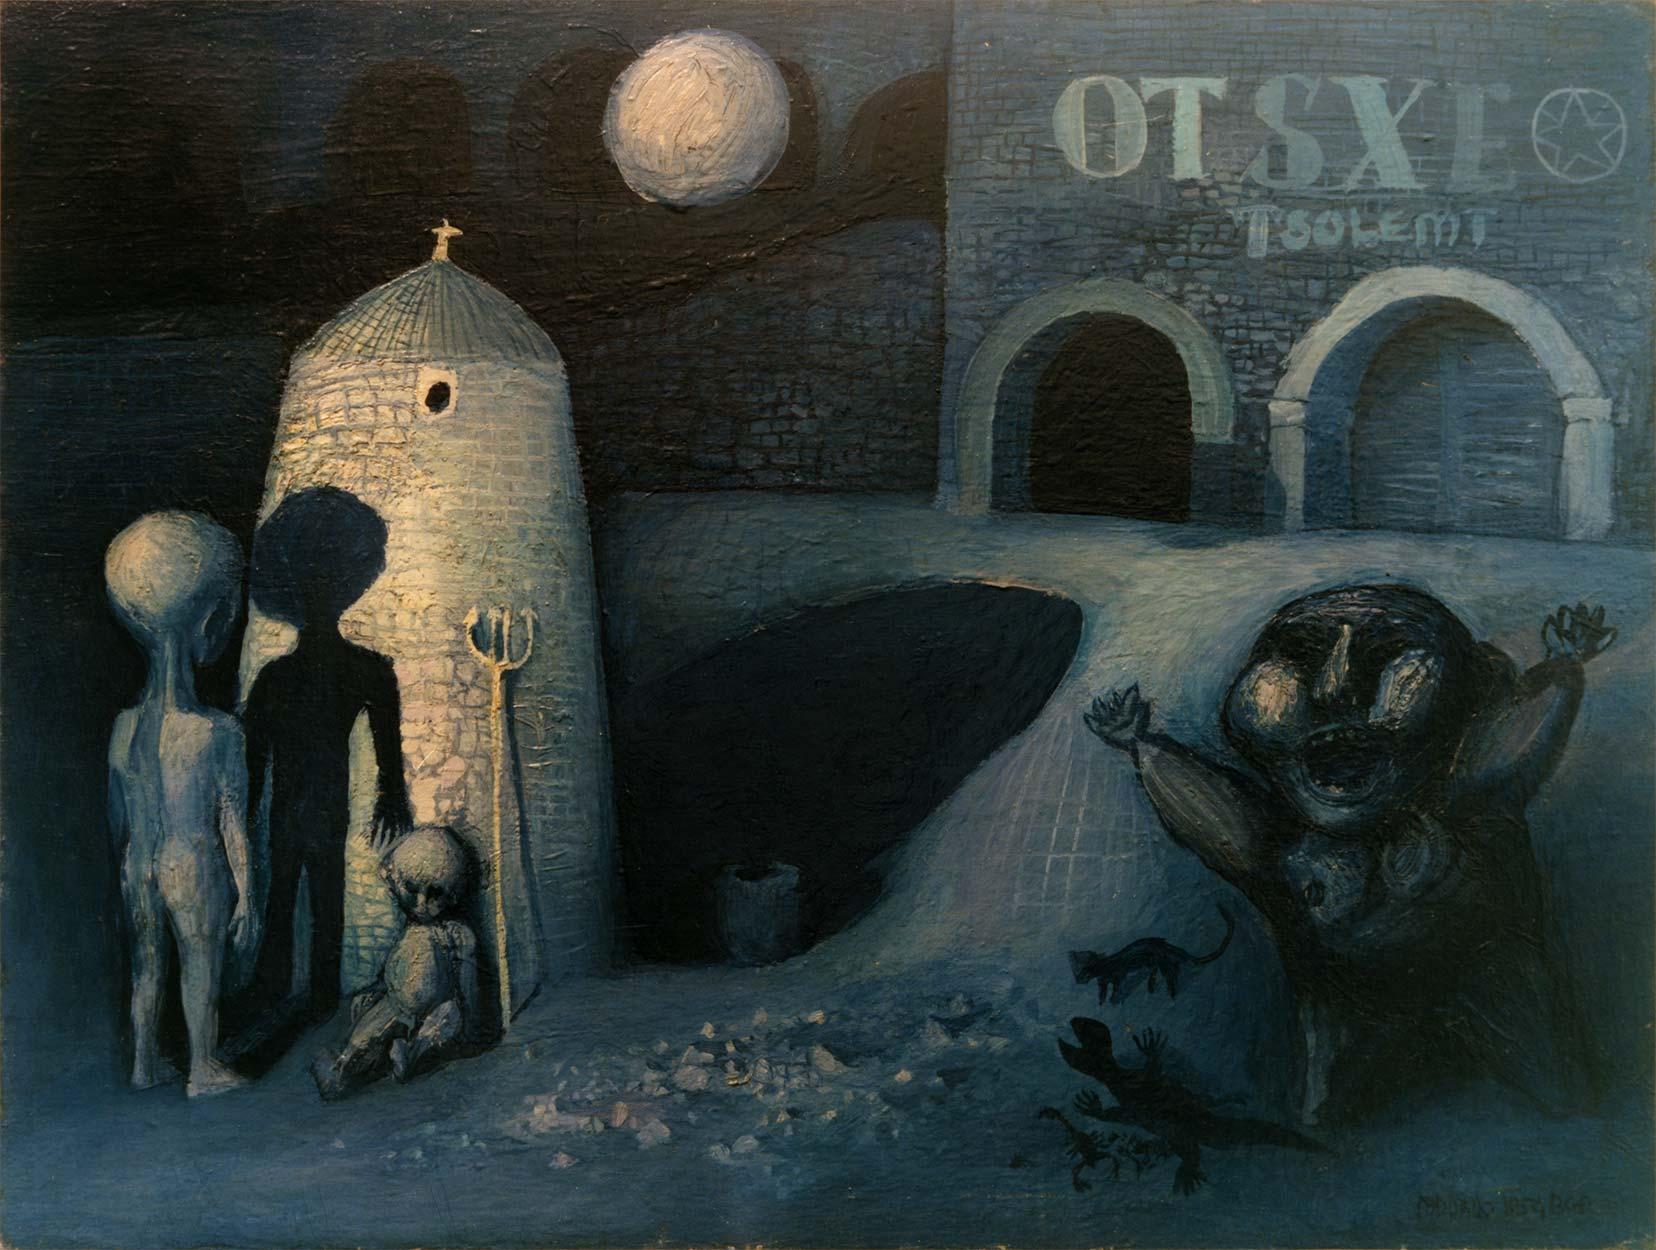 Dado: SBGD OTSXE Isolation, 1954